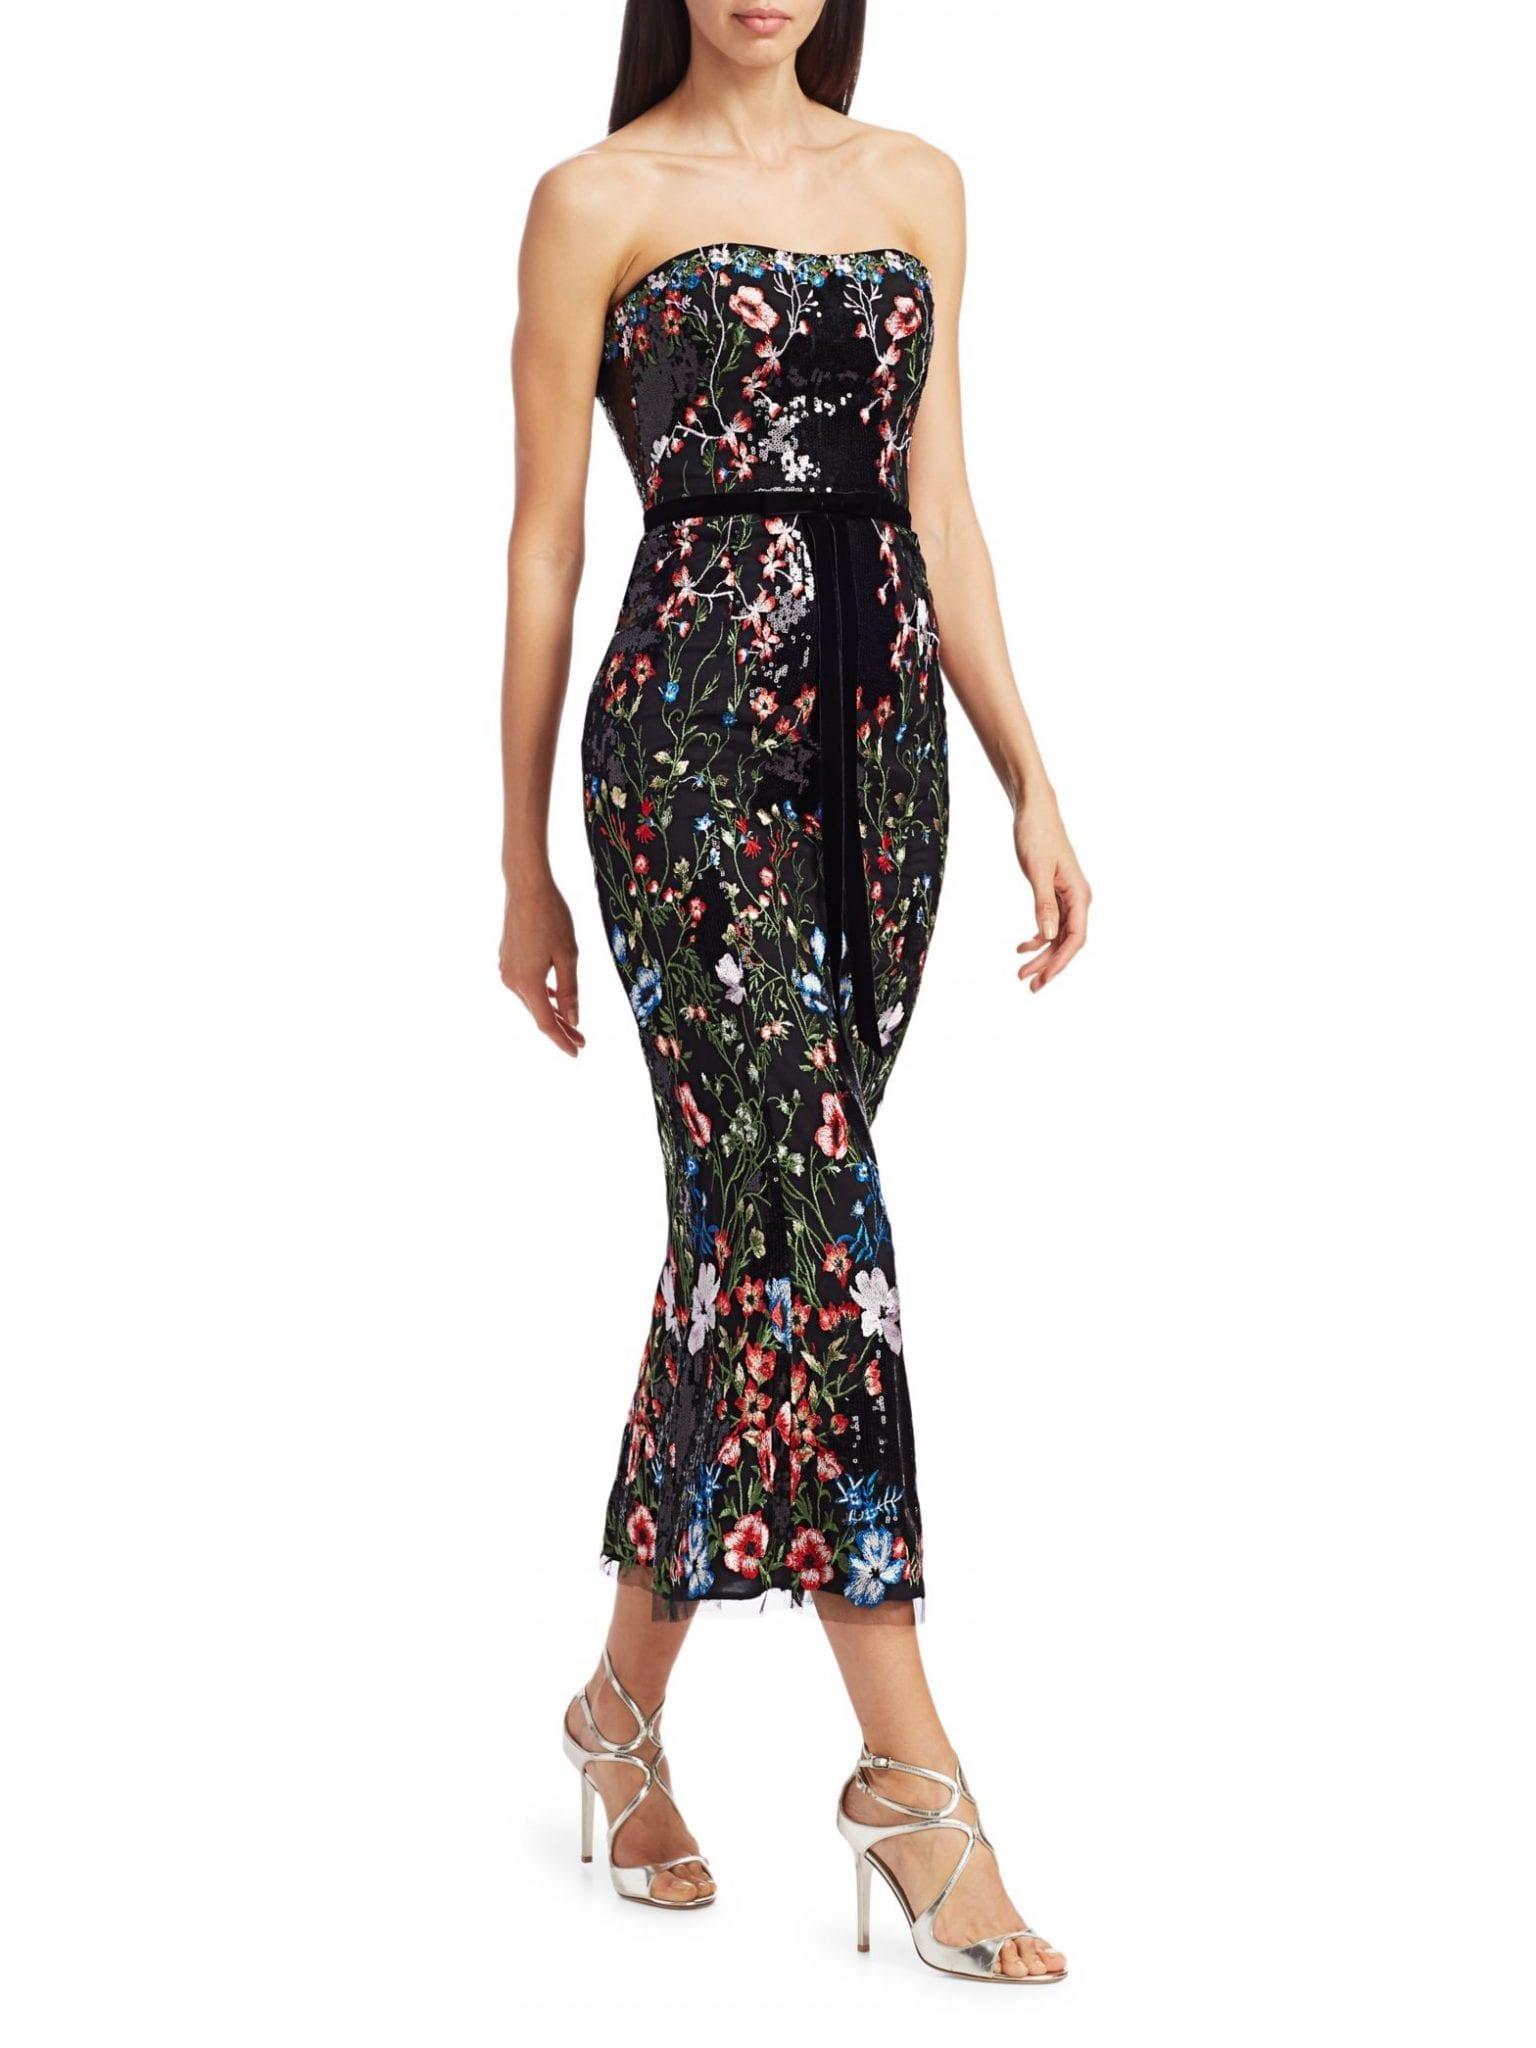 MARCHESA NOTTE Strapless Sequin Embellished Cocktail Dress